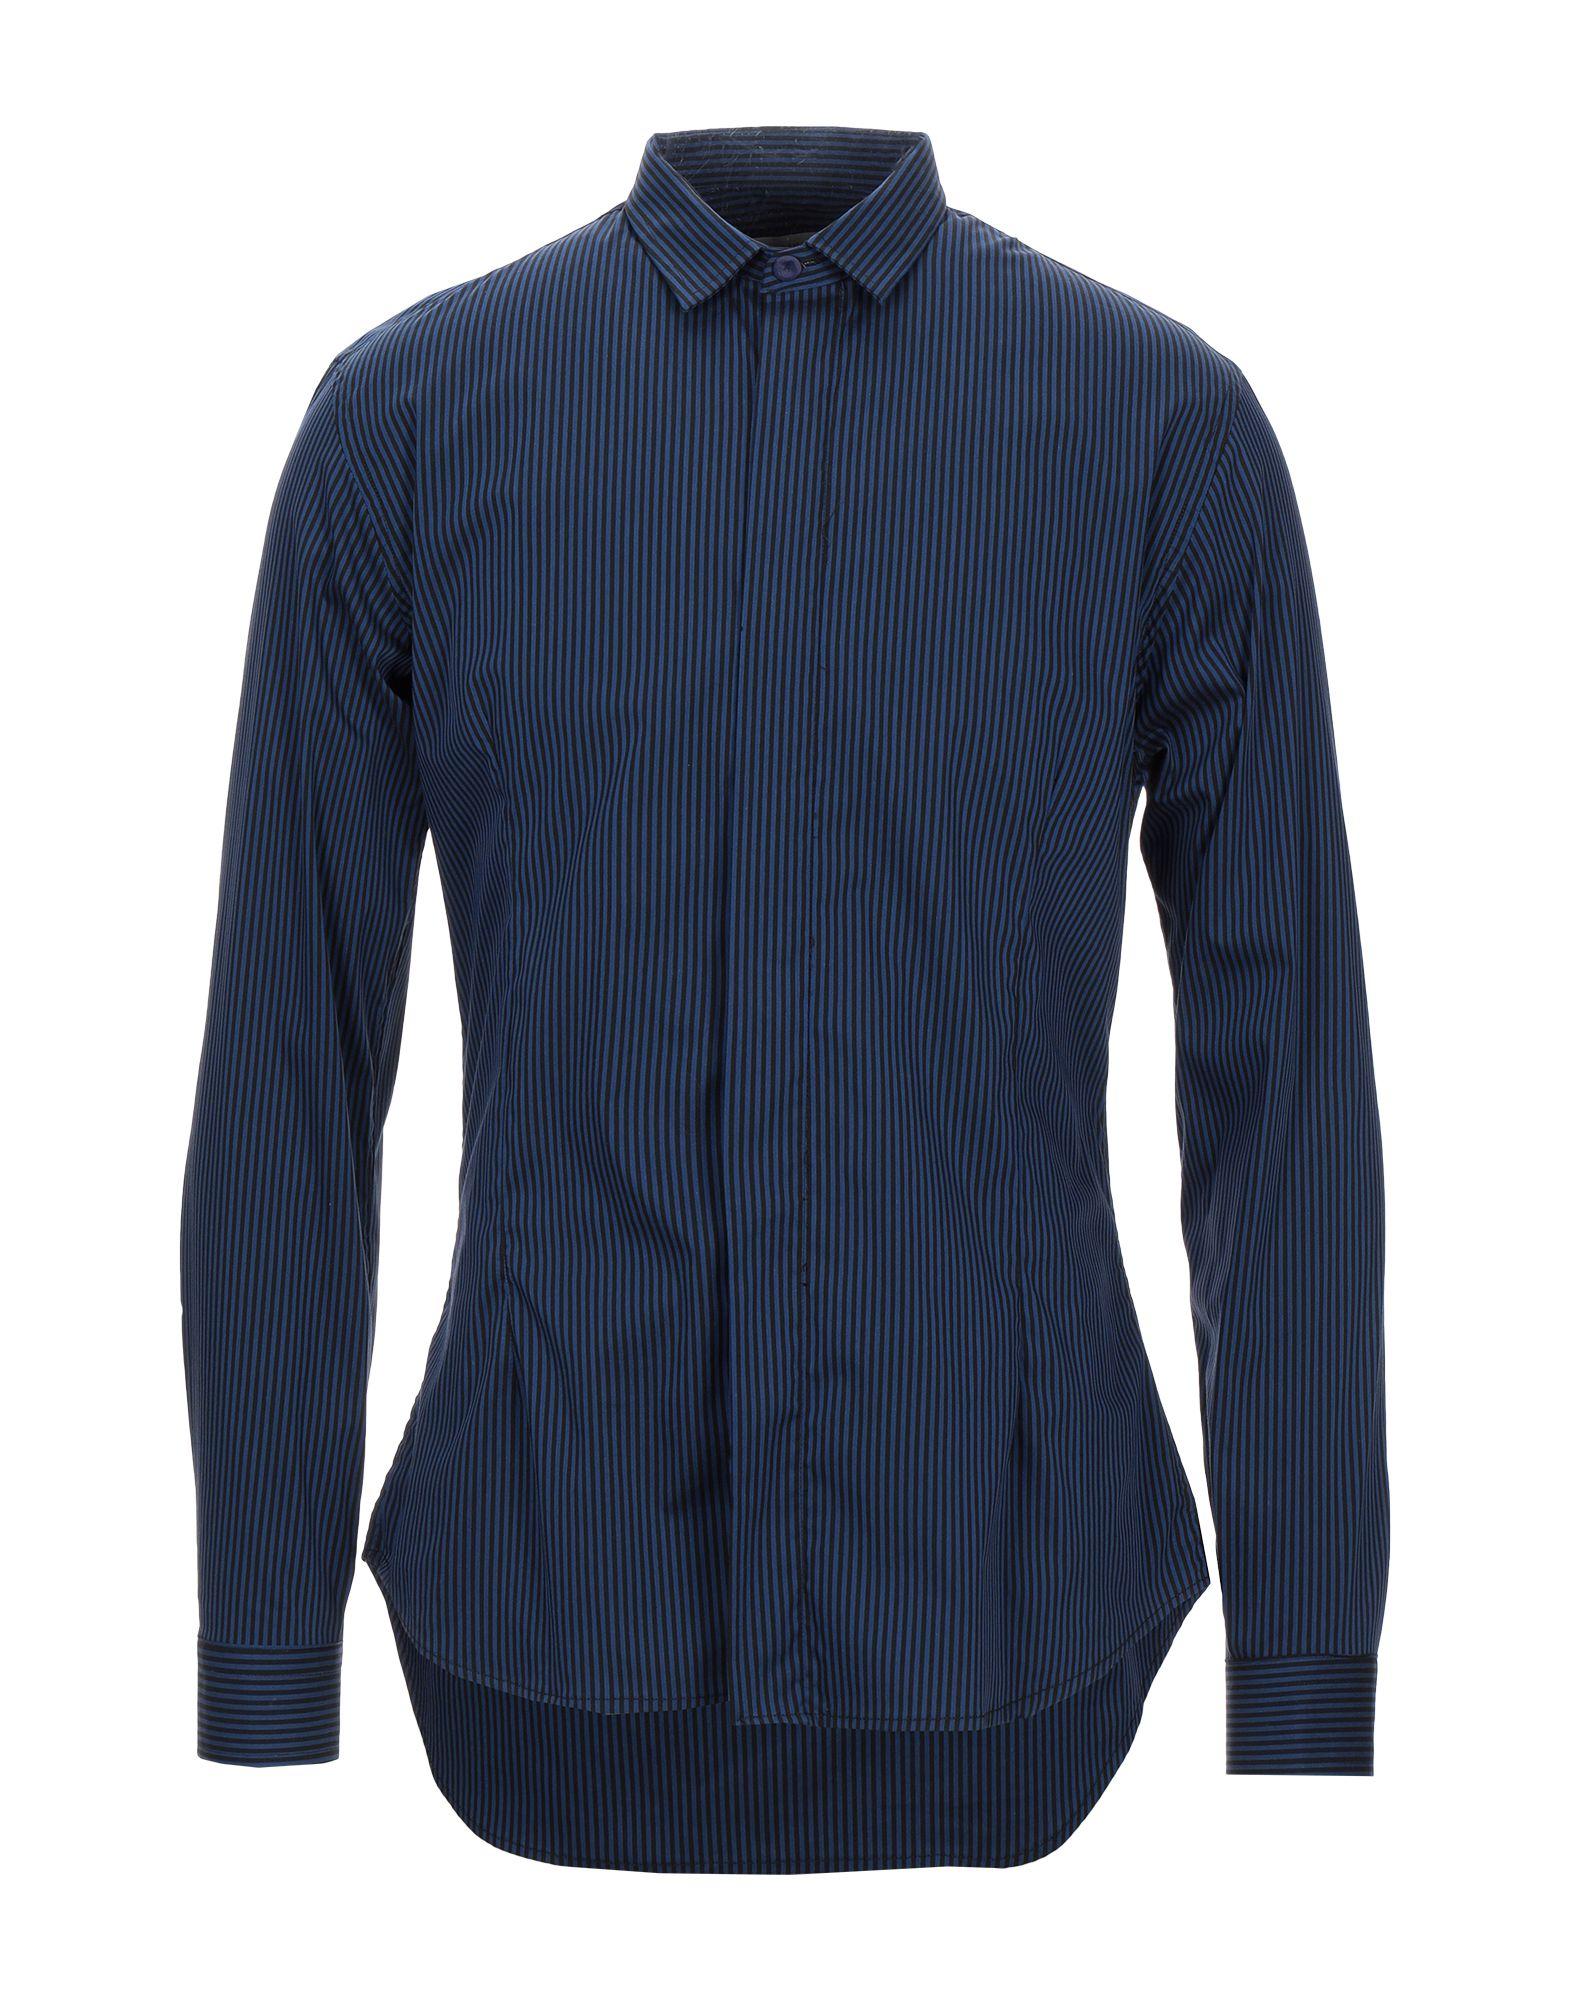 NEILL KATTER Shirts - Item 12459300